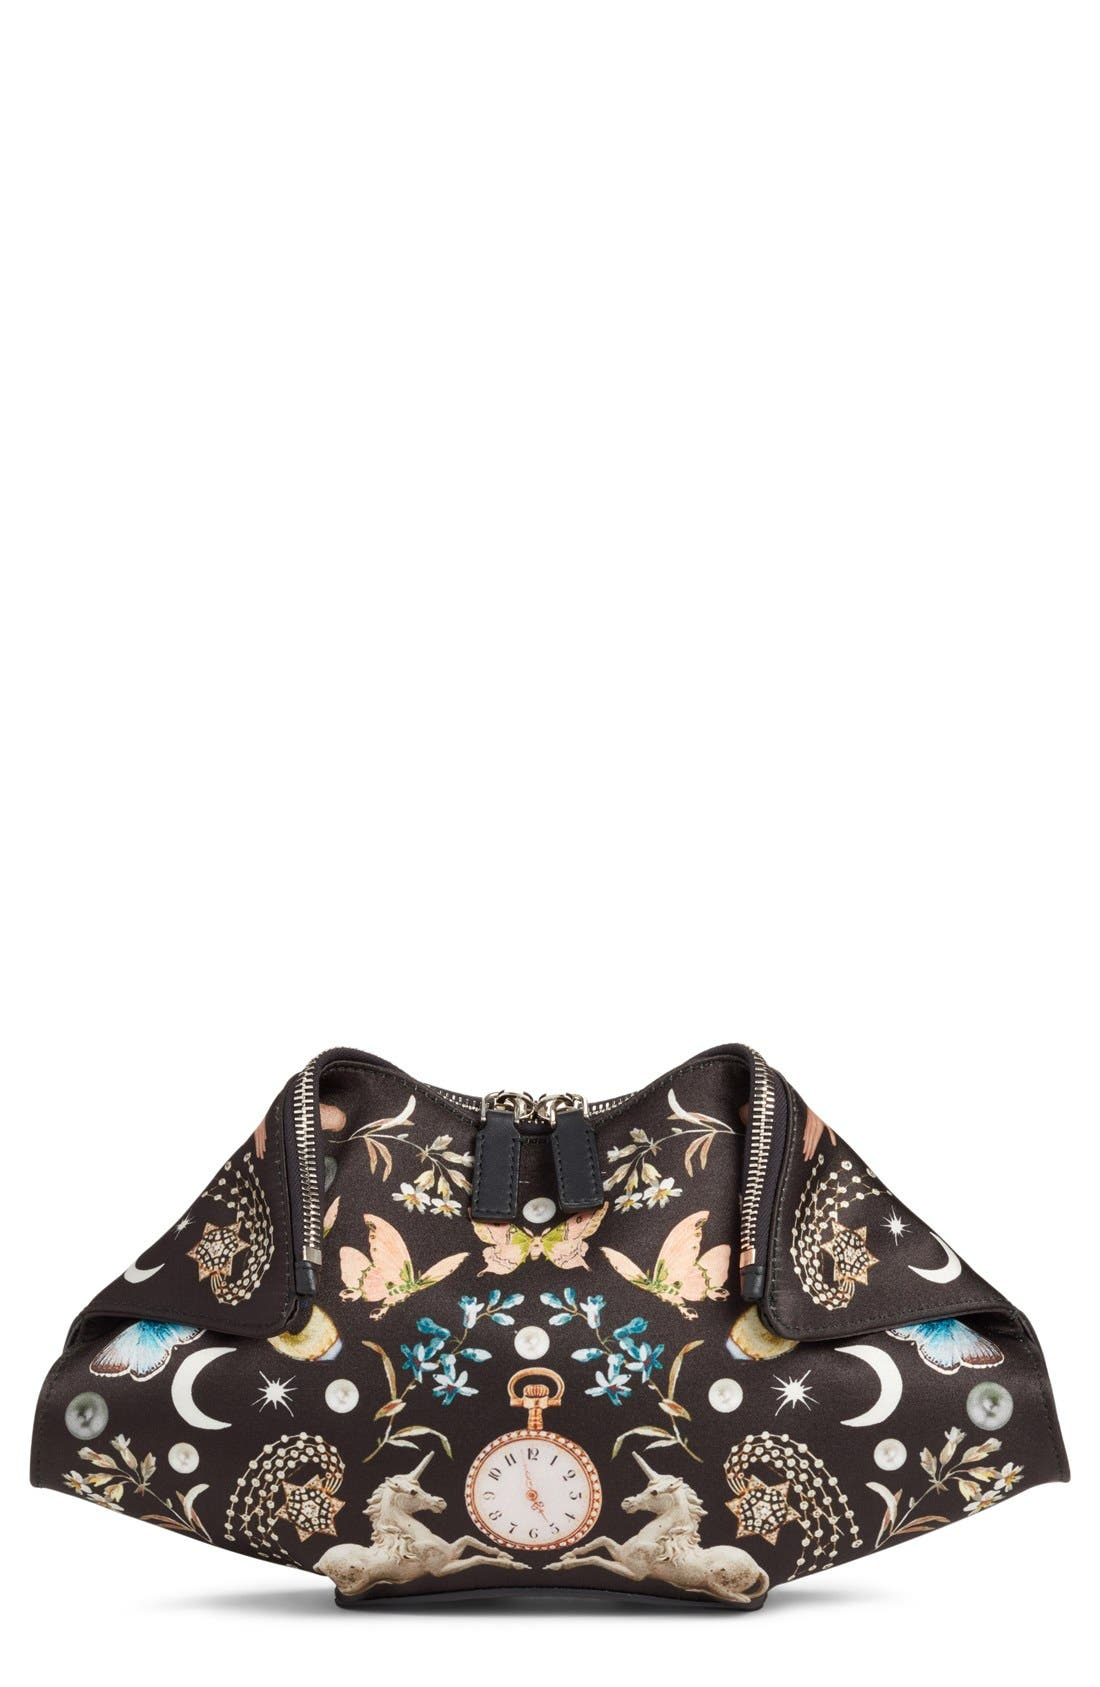 Alternate Image 1 Selected - Alexander McQueen Small De Manta Silk Clutch